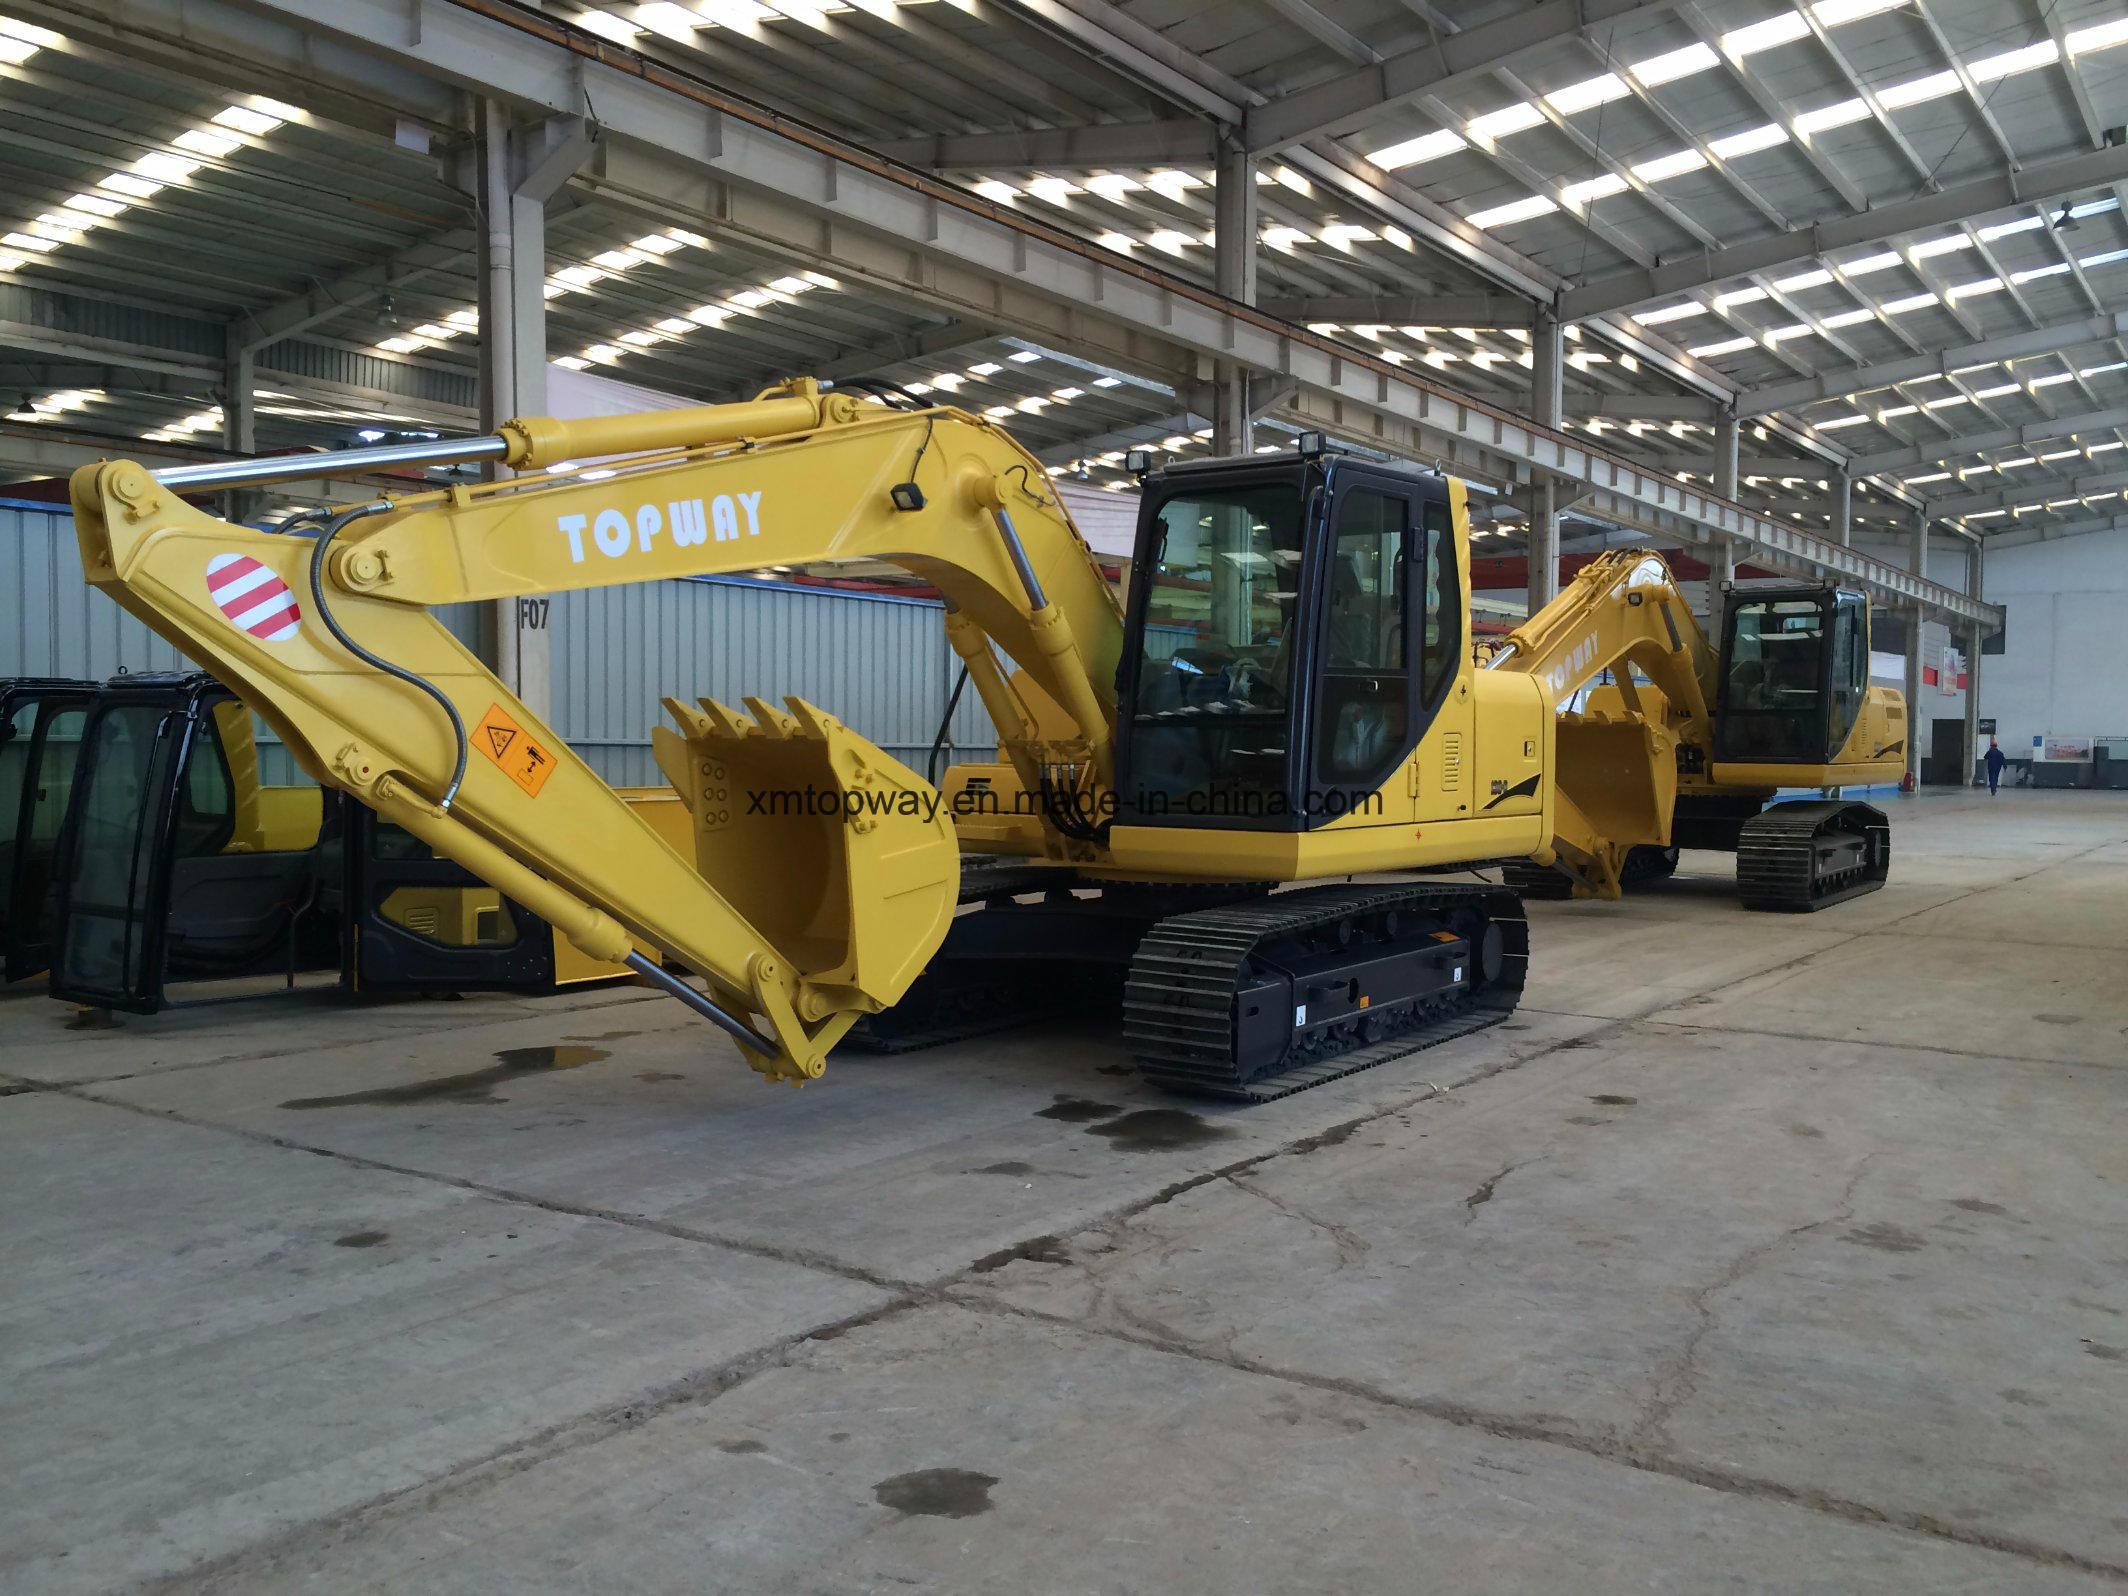 High Quality 21ton Isuzu Engine Crawl Excavator, Excavator, Hydraulic Excavator for Sale